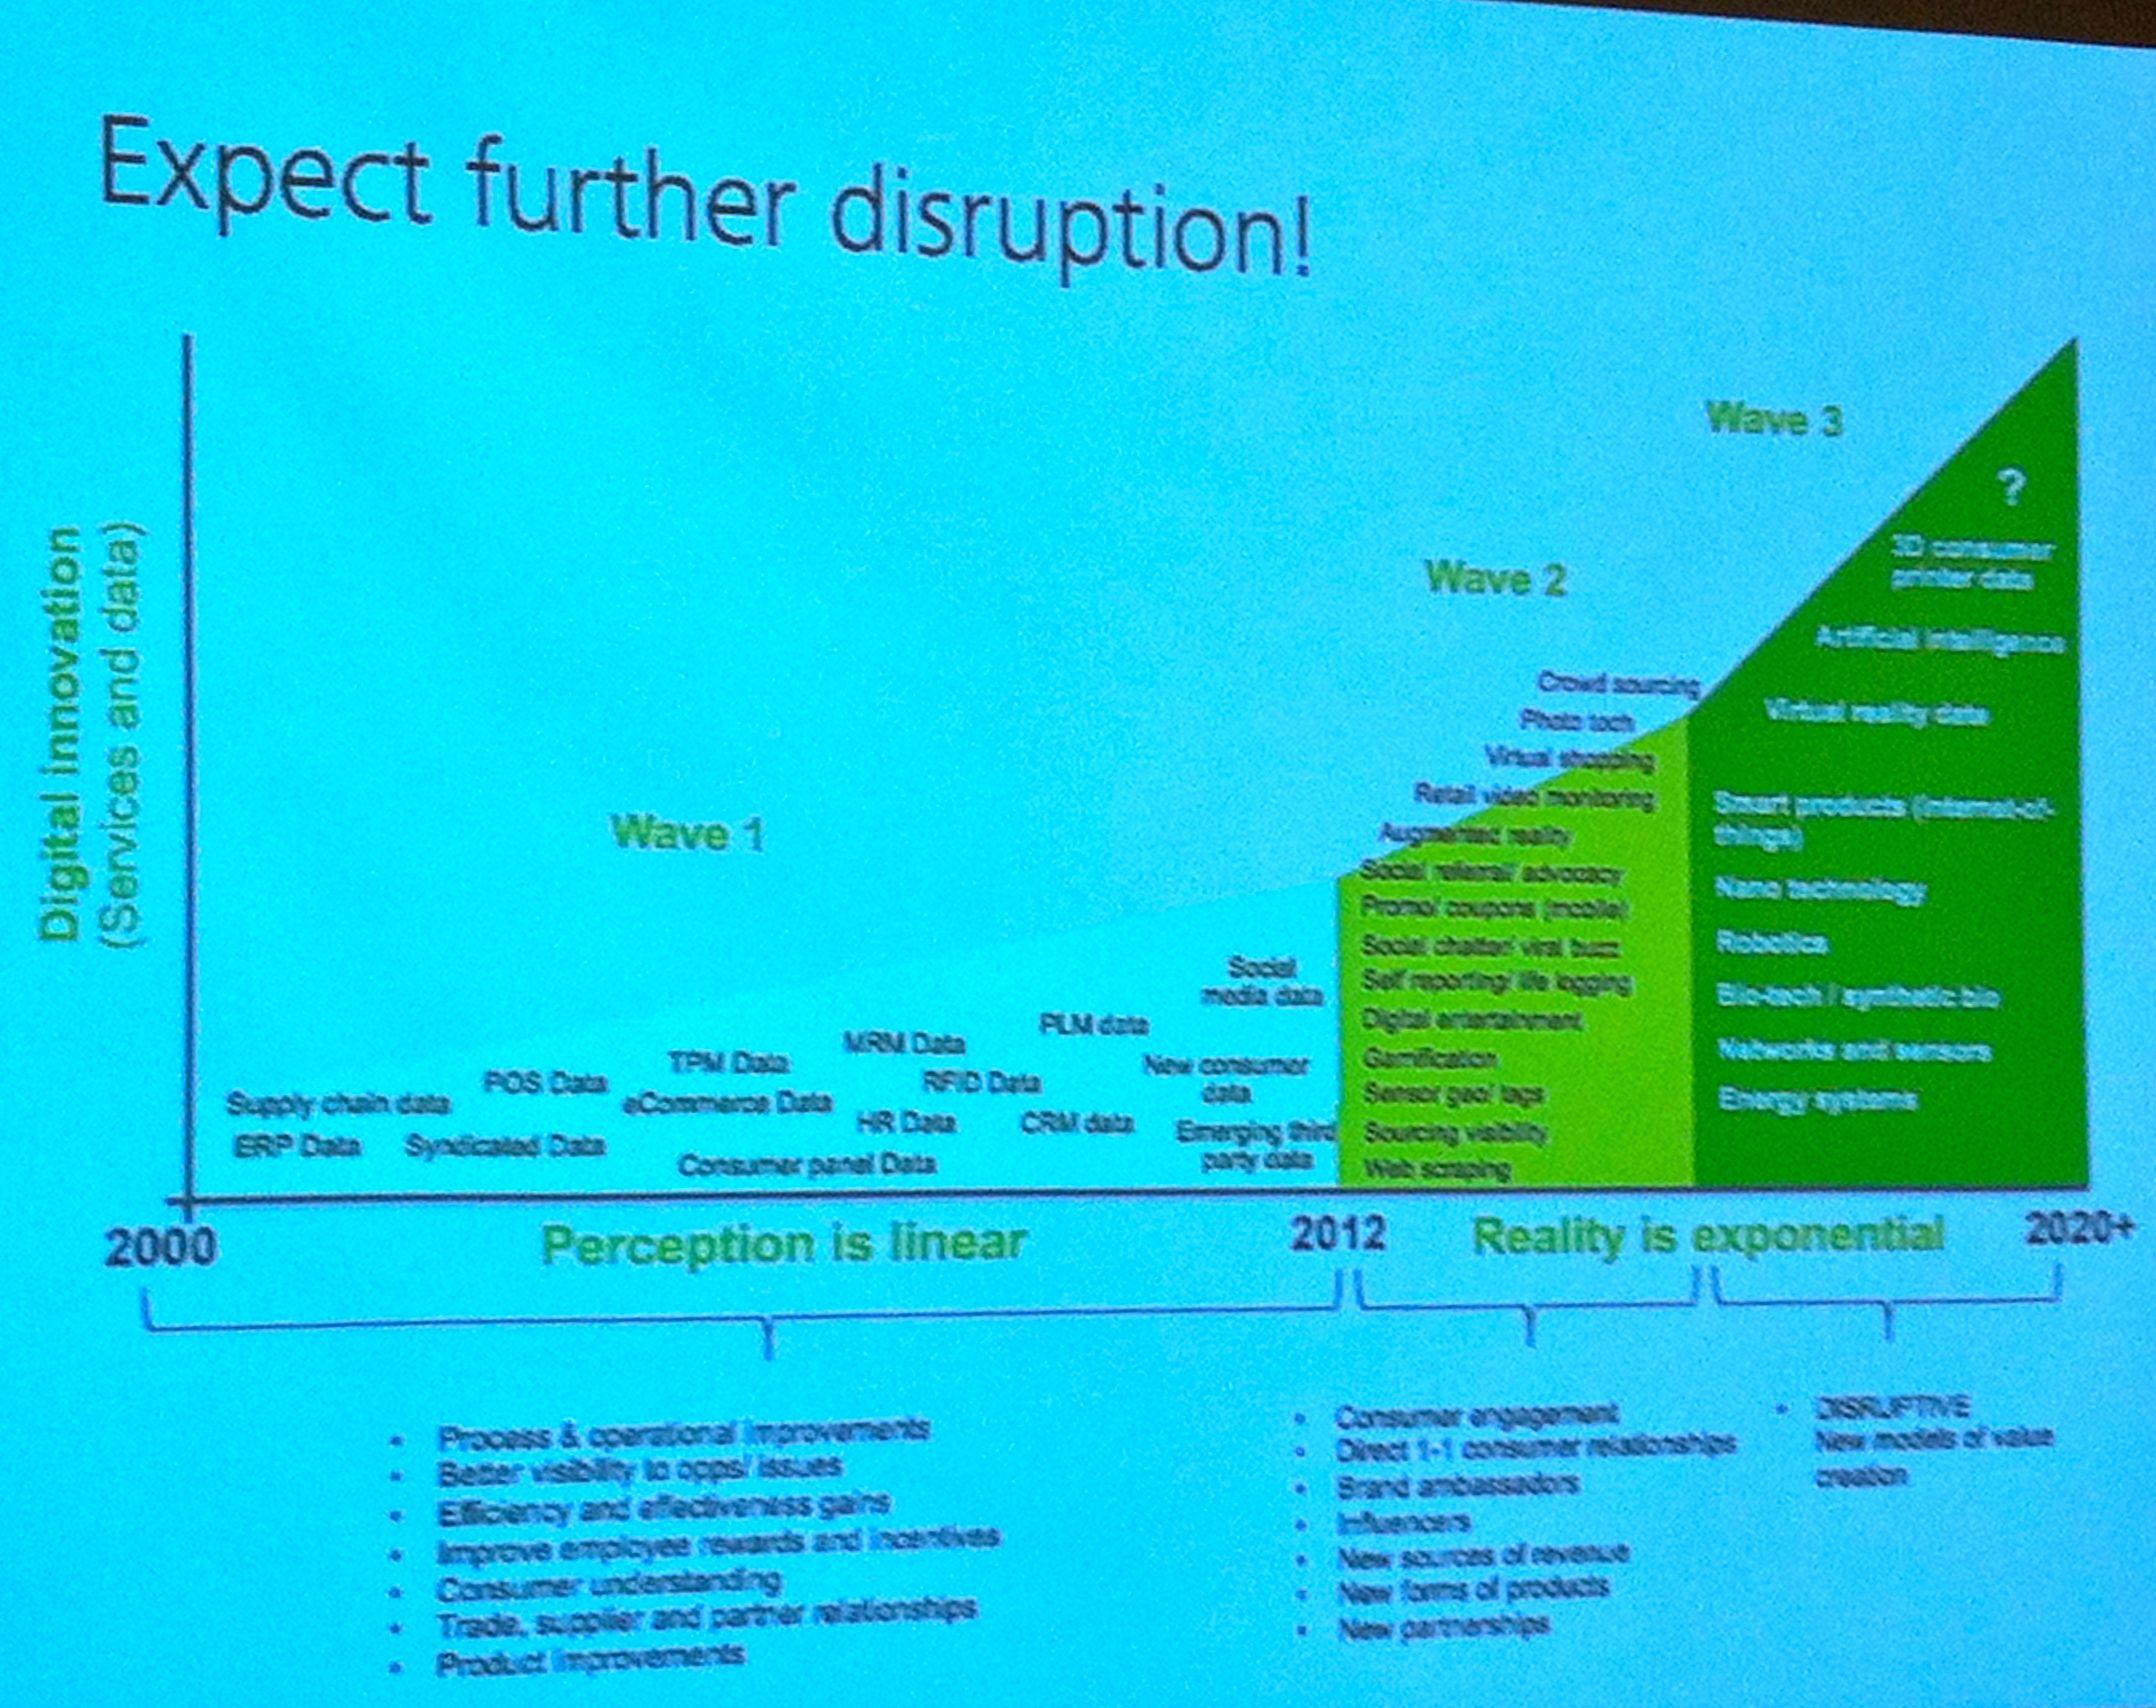 Deloitte Digital - Mobile Disruption